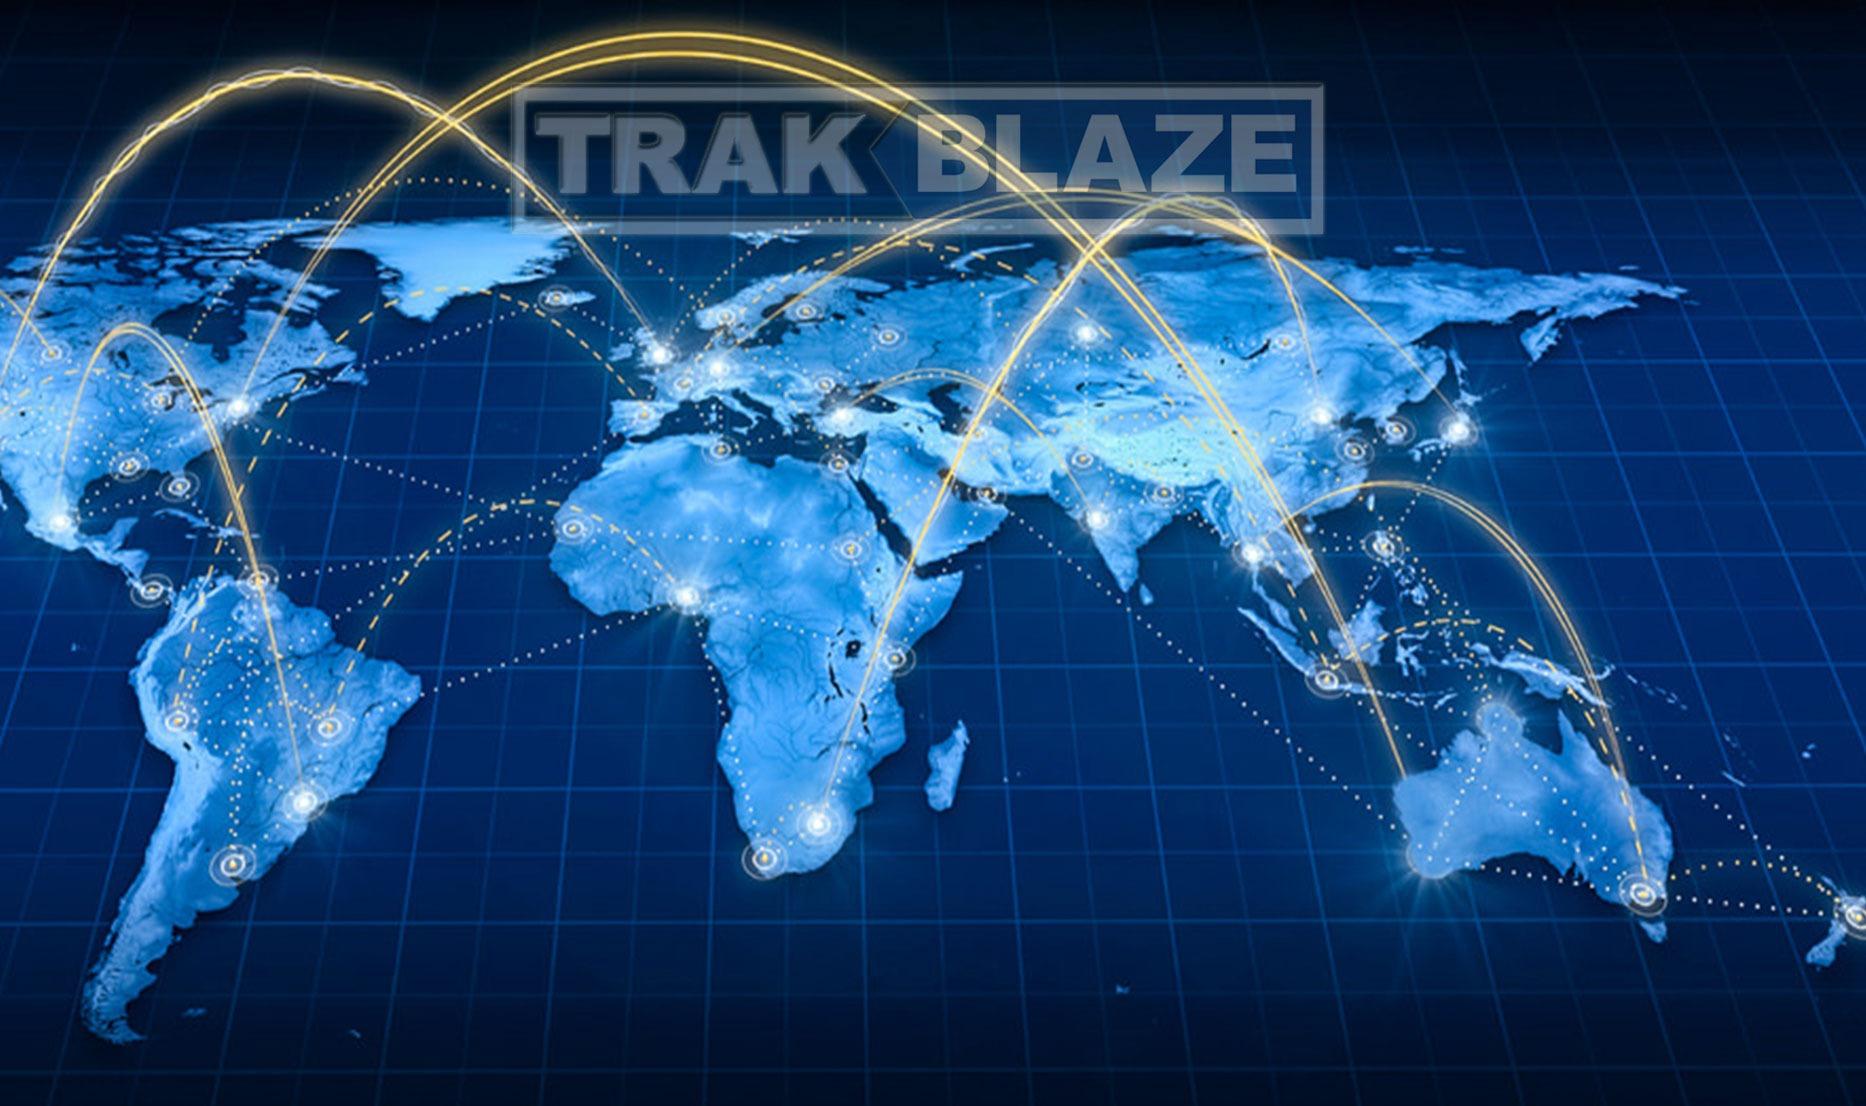 Trakblaze locations